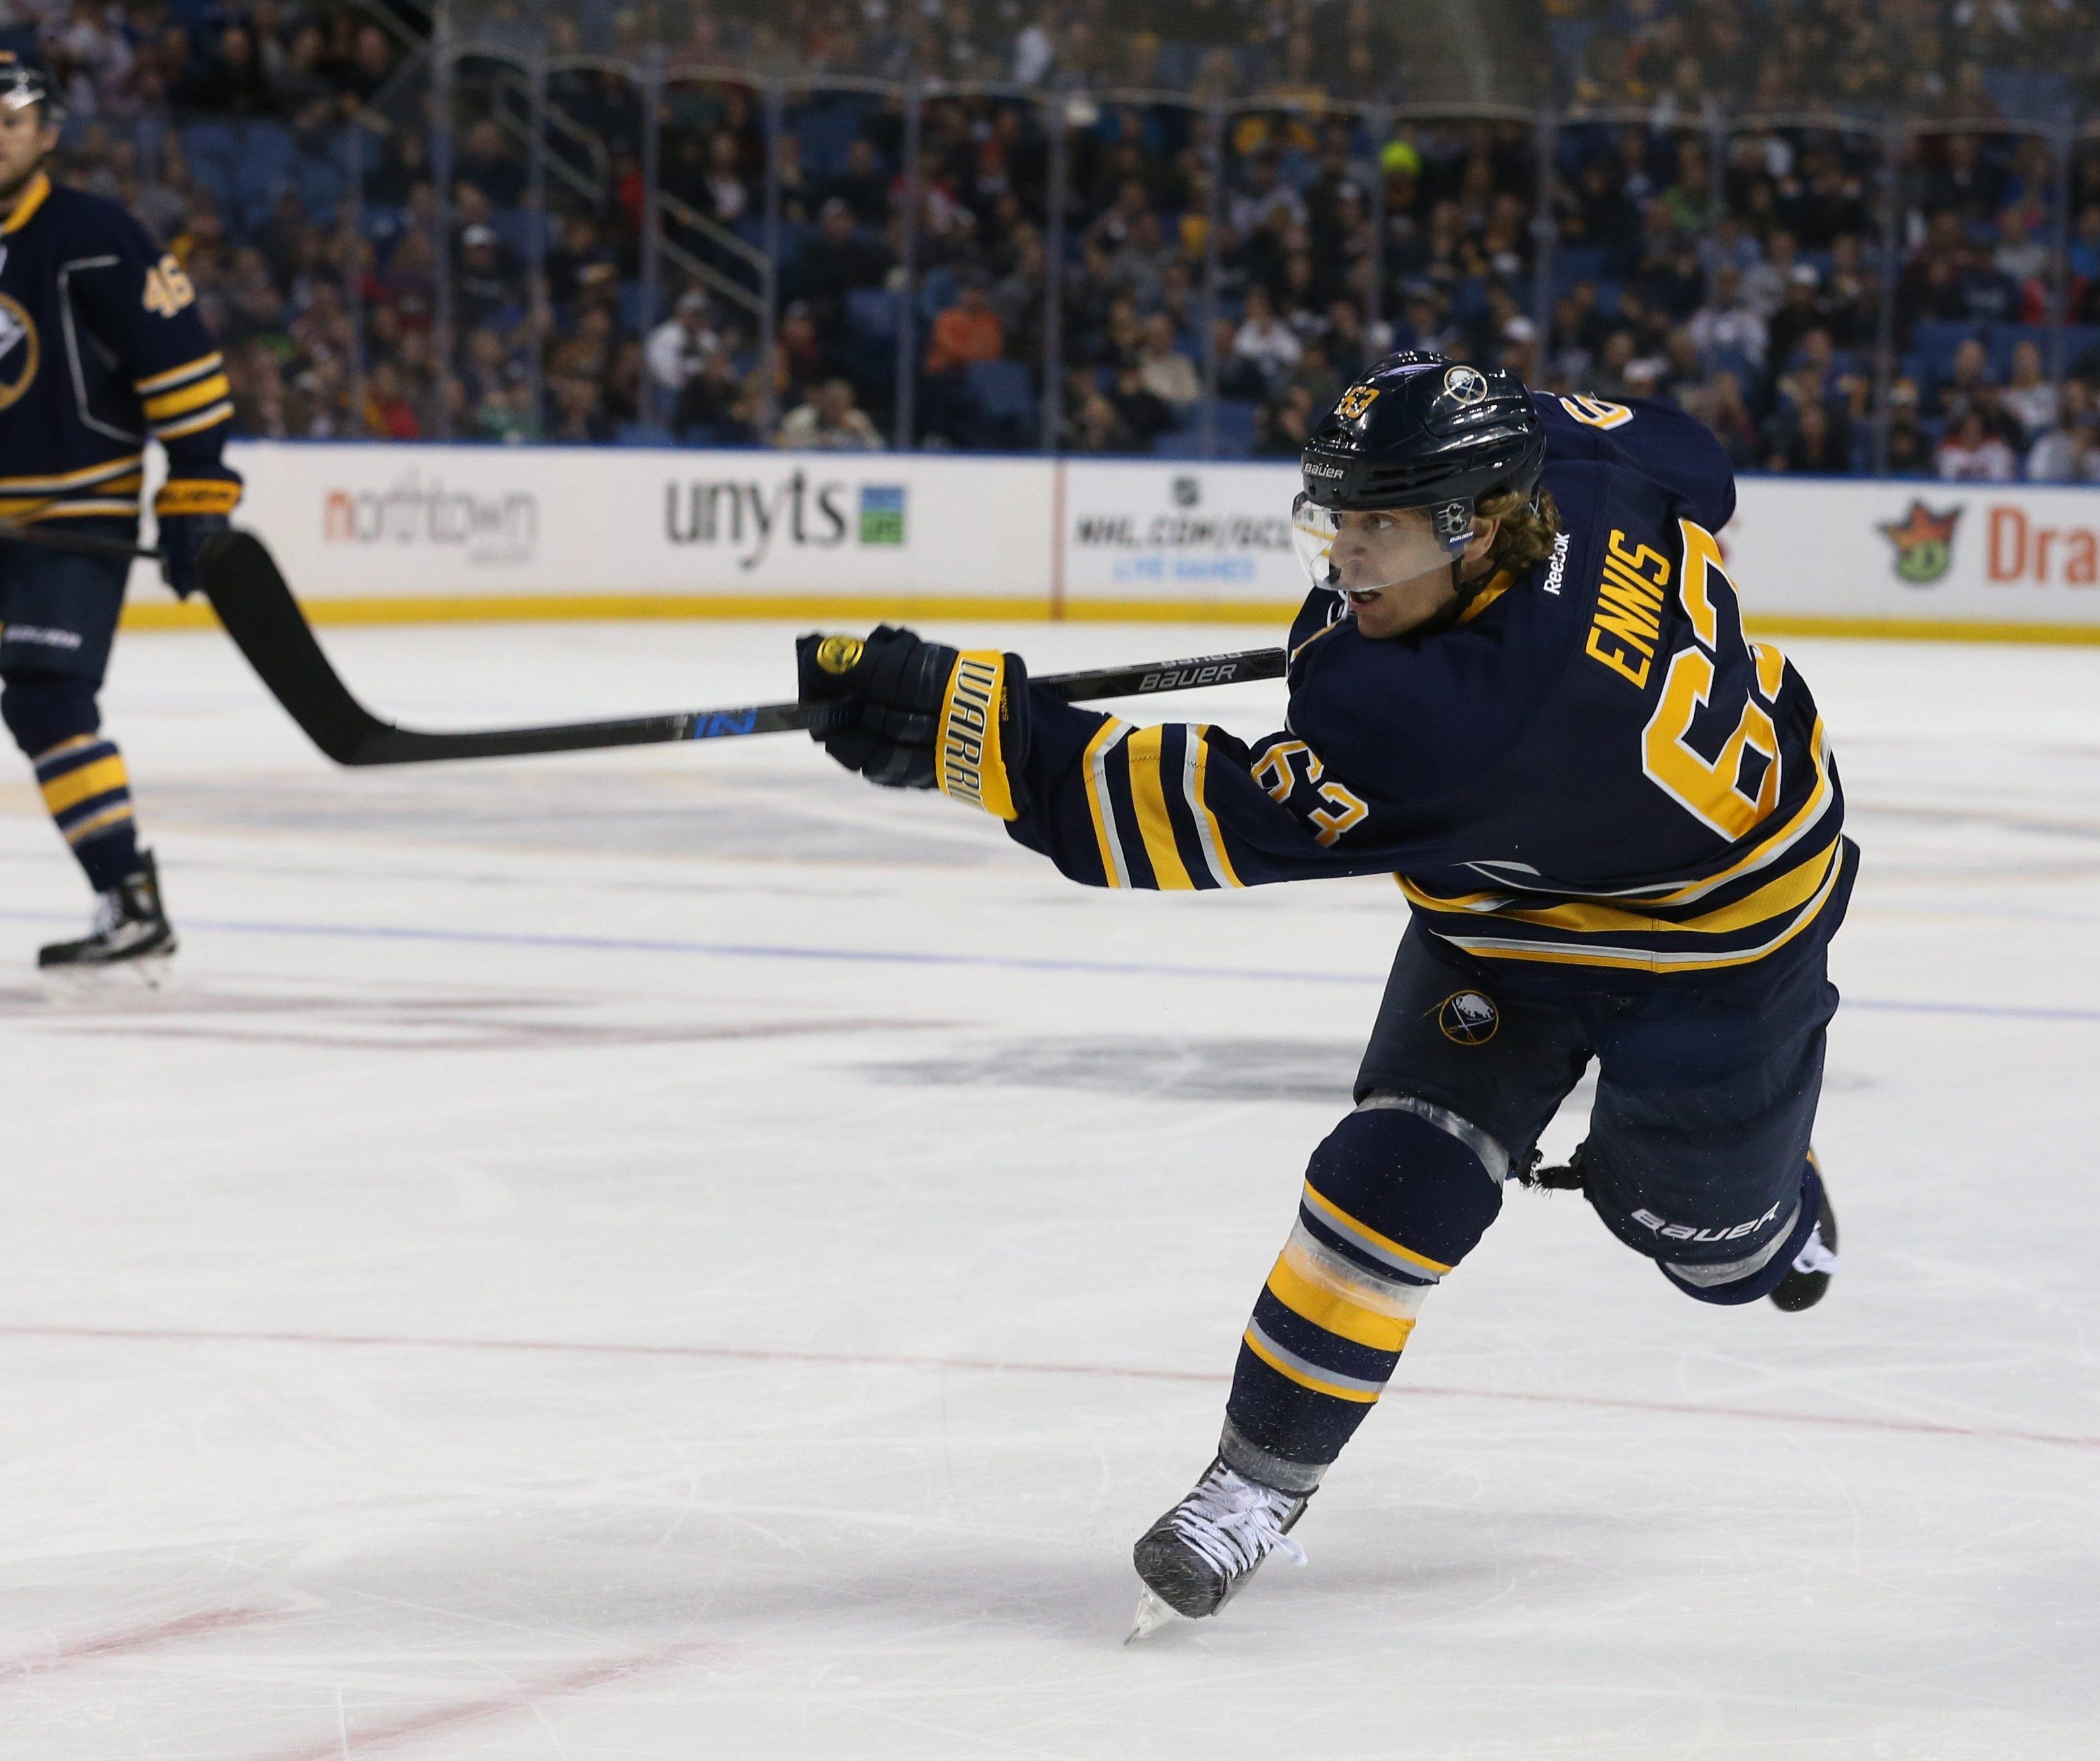 Tyler Ennis hasn't played since absorbing a jolting hit Dec. 30. (Photo by Sharon Cantillon/Buffalo News)